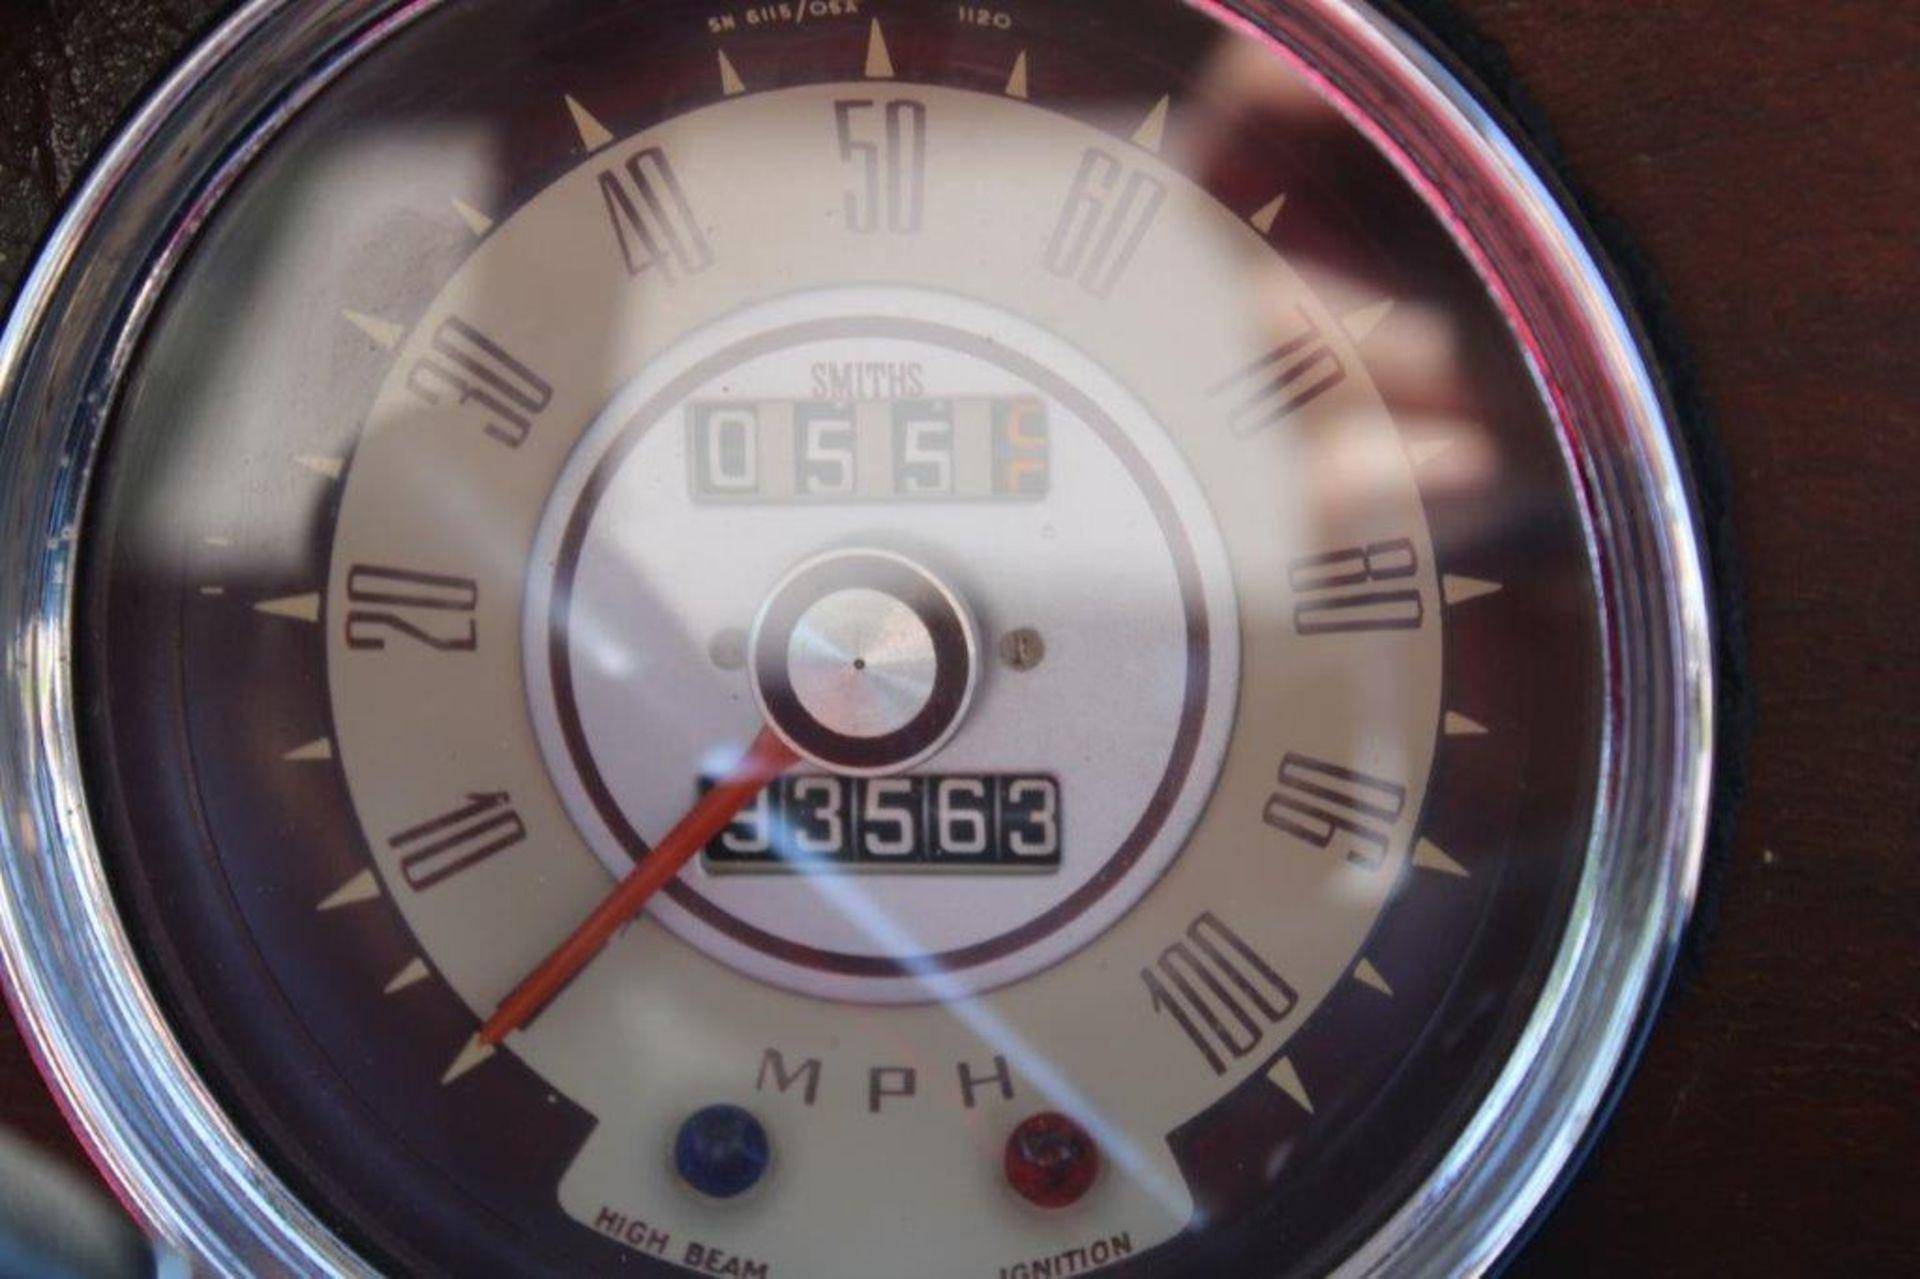 1969 Wolseley 16/60 Auto - Image 20 of 31